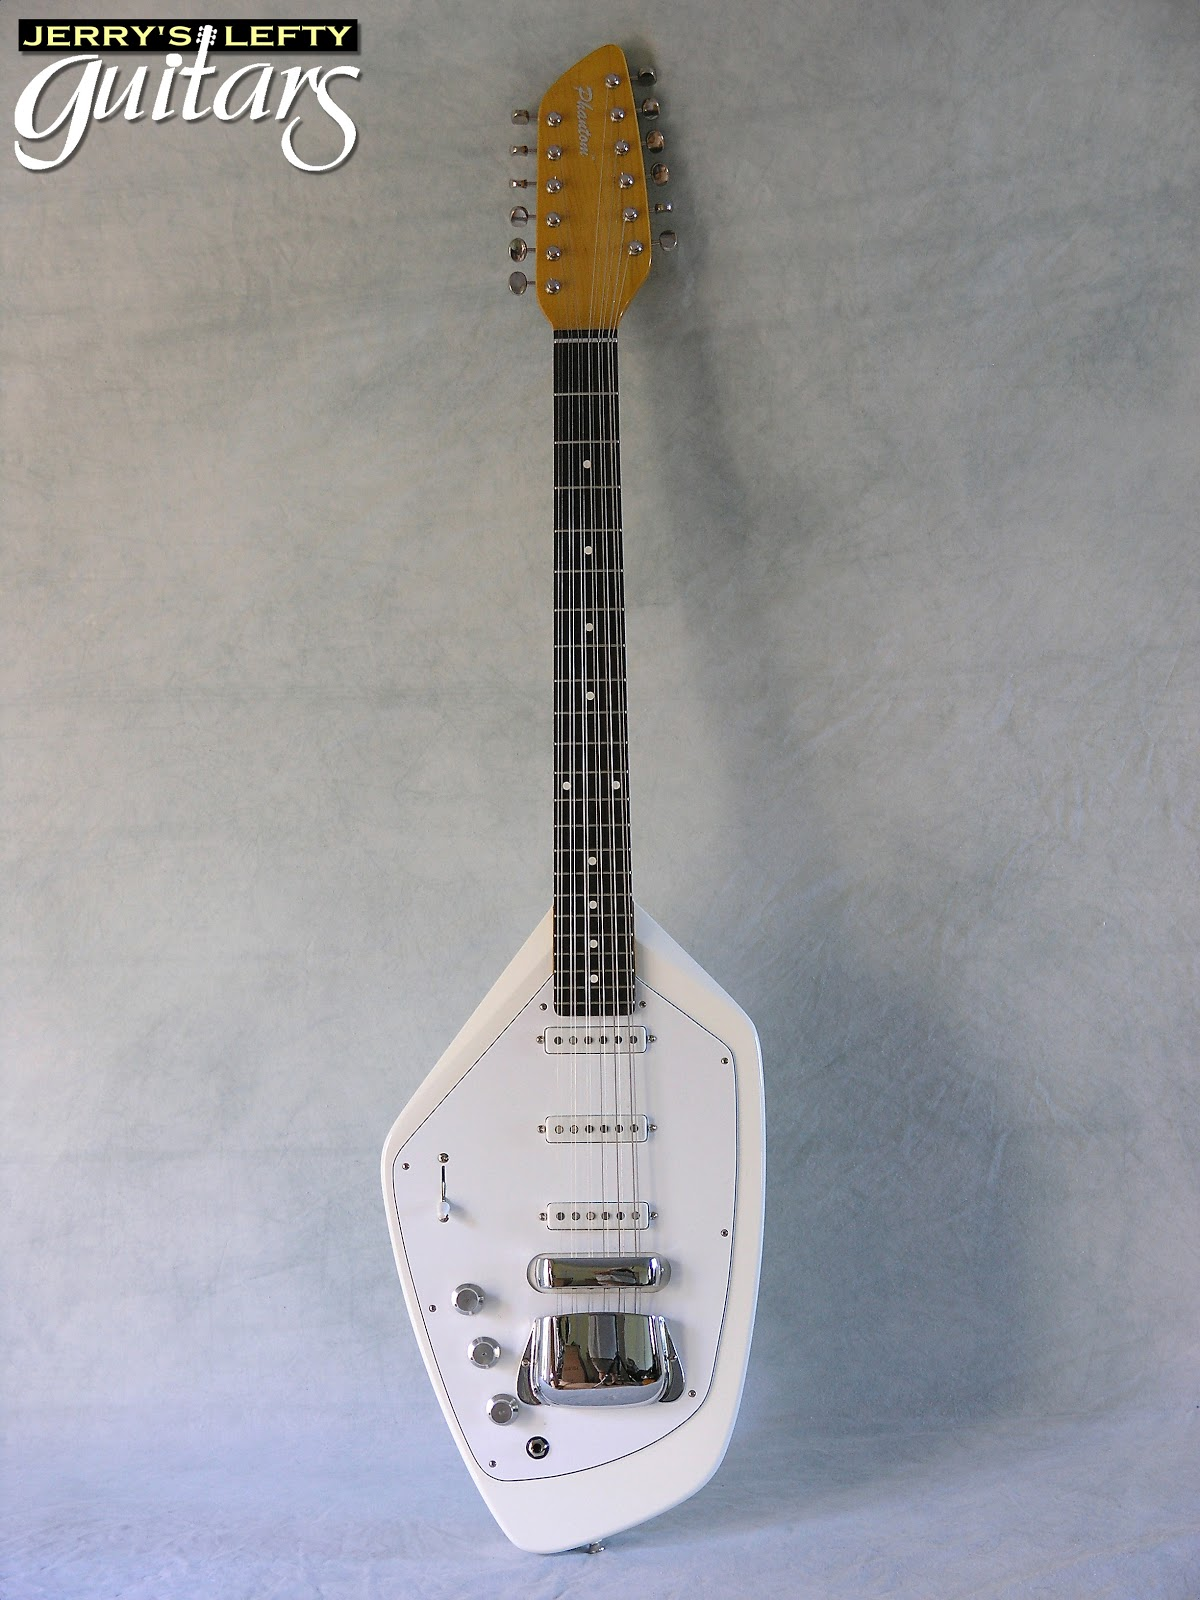 jerry 39 s lefty guitars newest guitar arrivals updated weekly phantom guitarworks 12 string. Black Bedroom Furniture Sets. Home Design Ideas